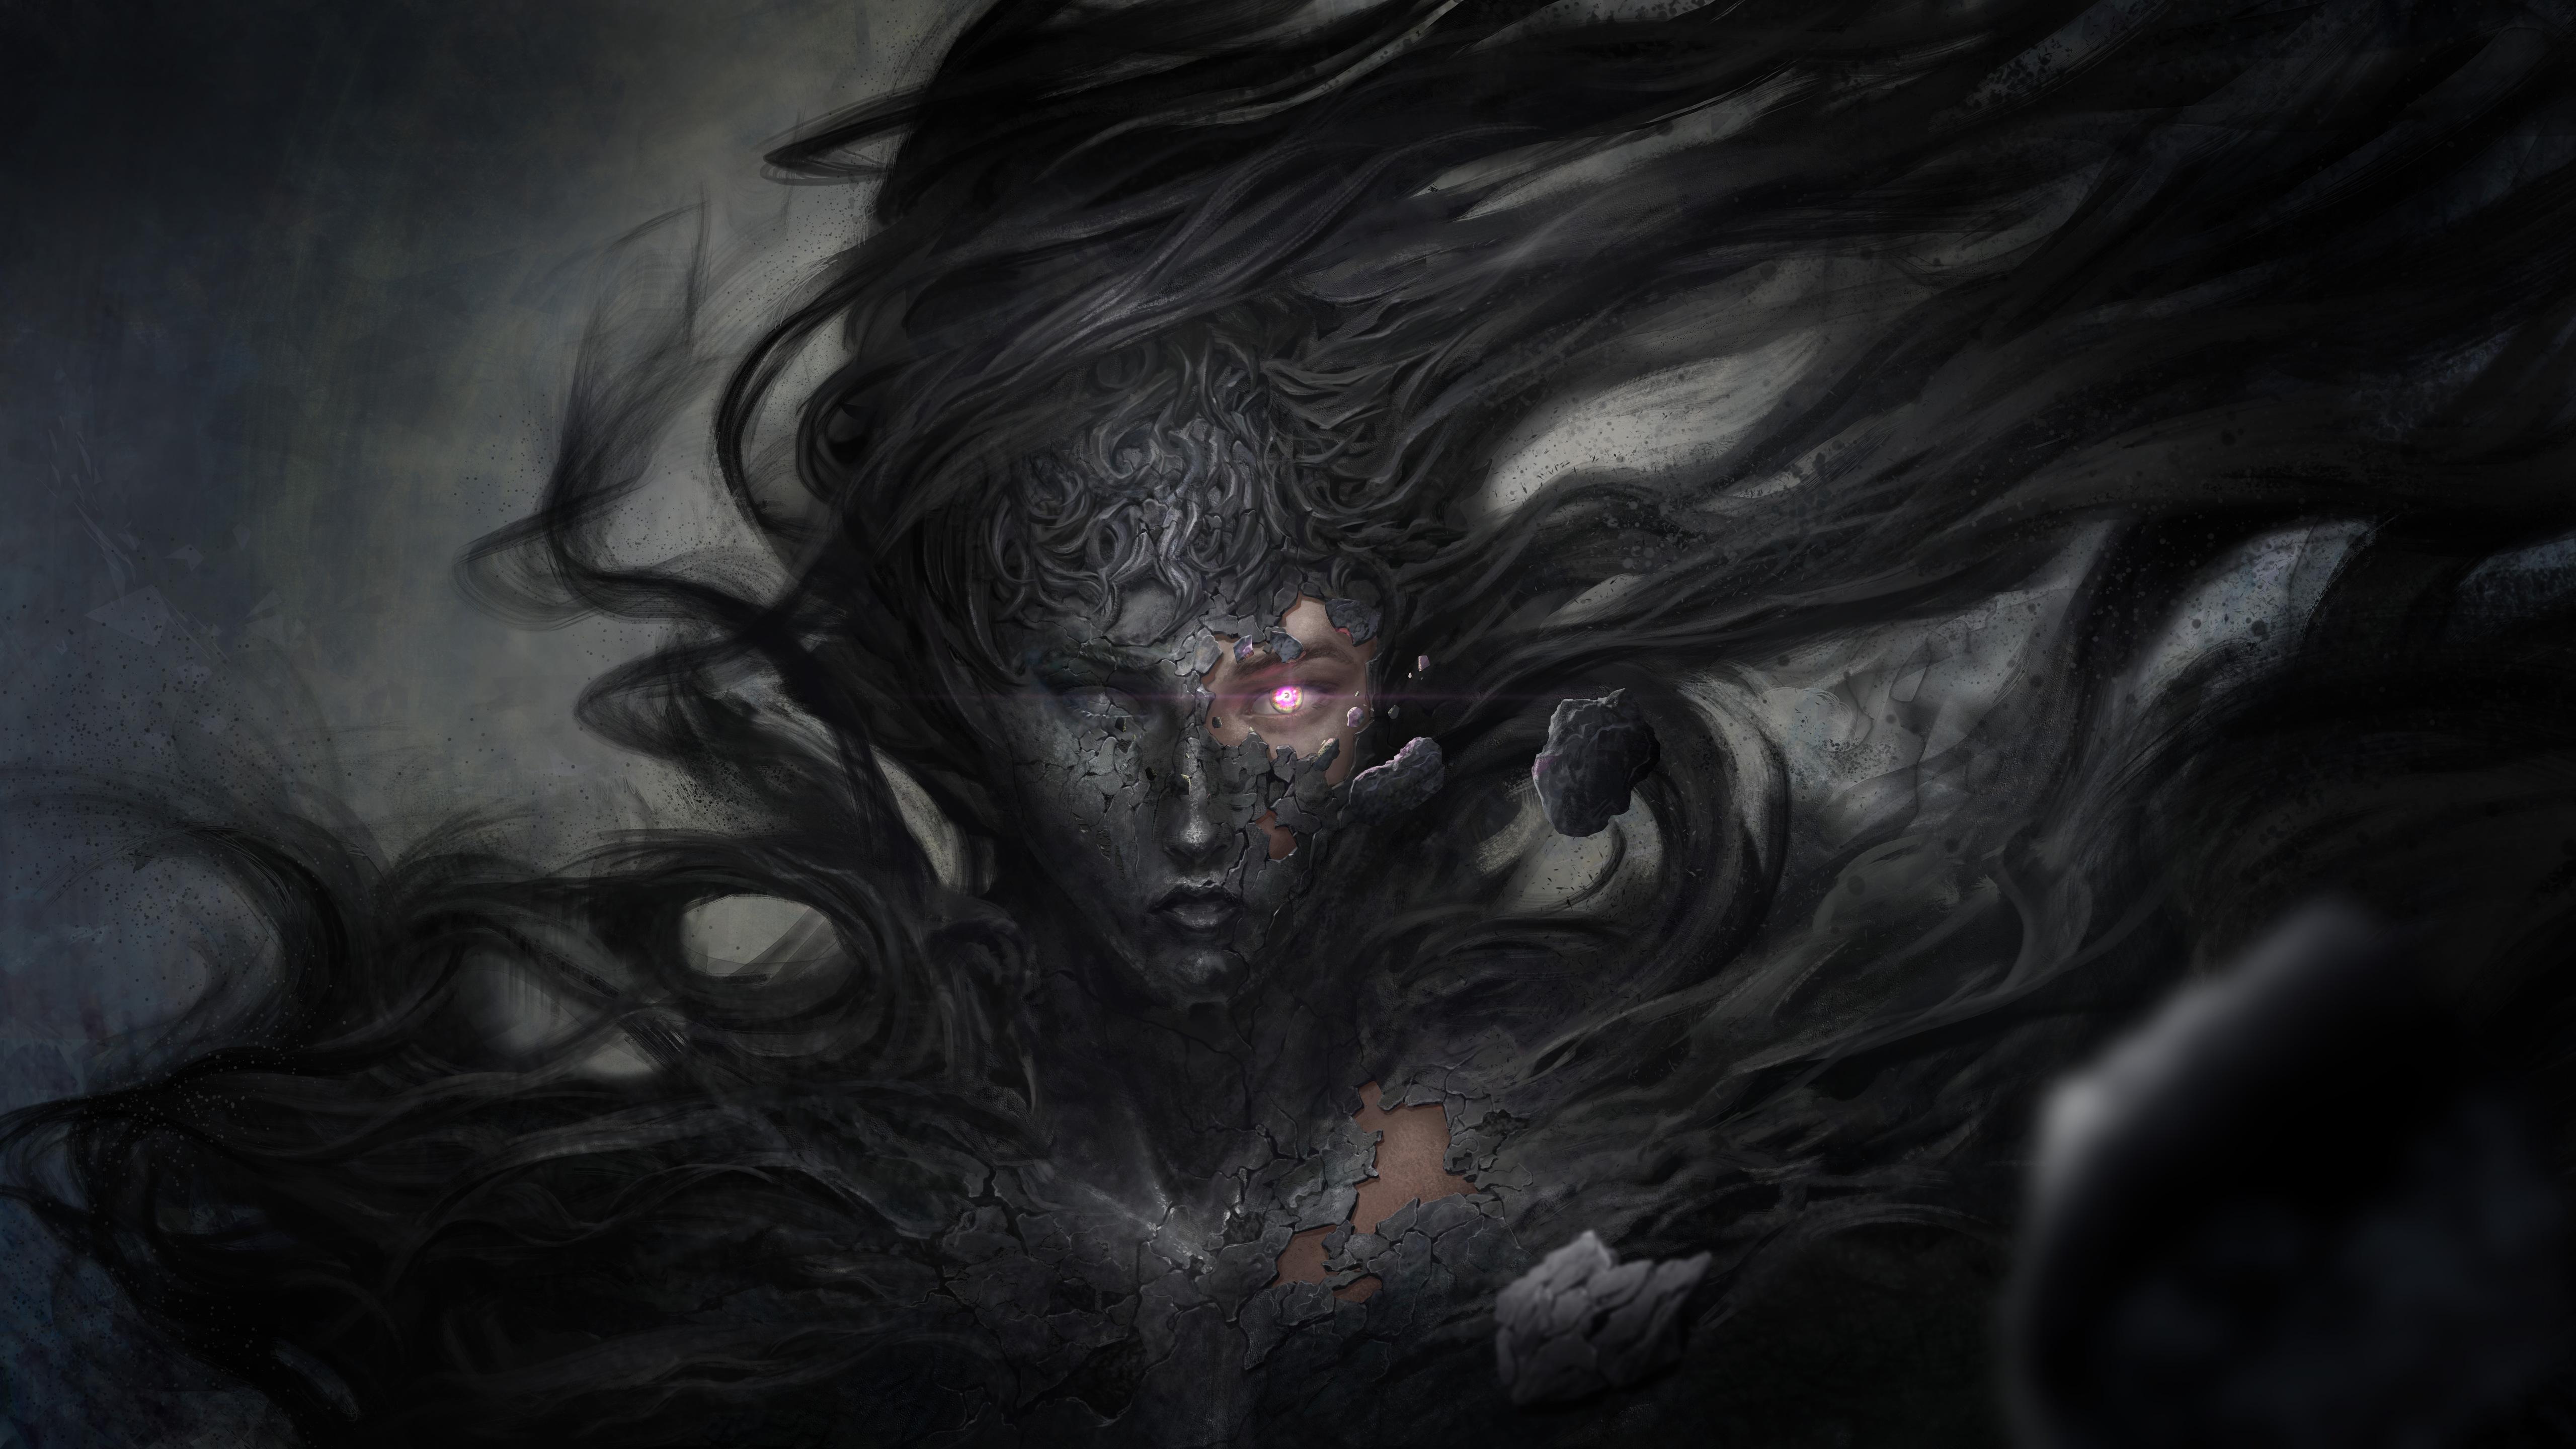 5120x2880 Dark Demon Fantasy Witch 8k 5k HD 4k Wallpapers